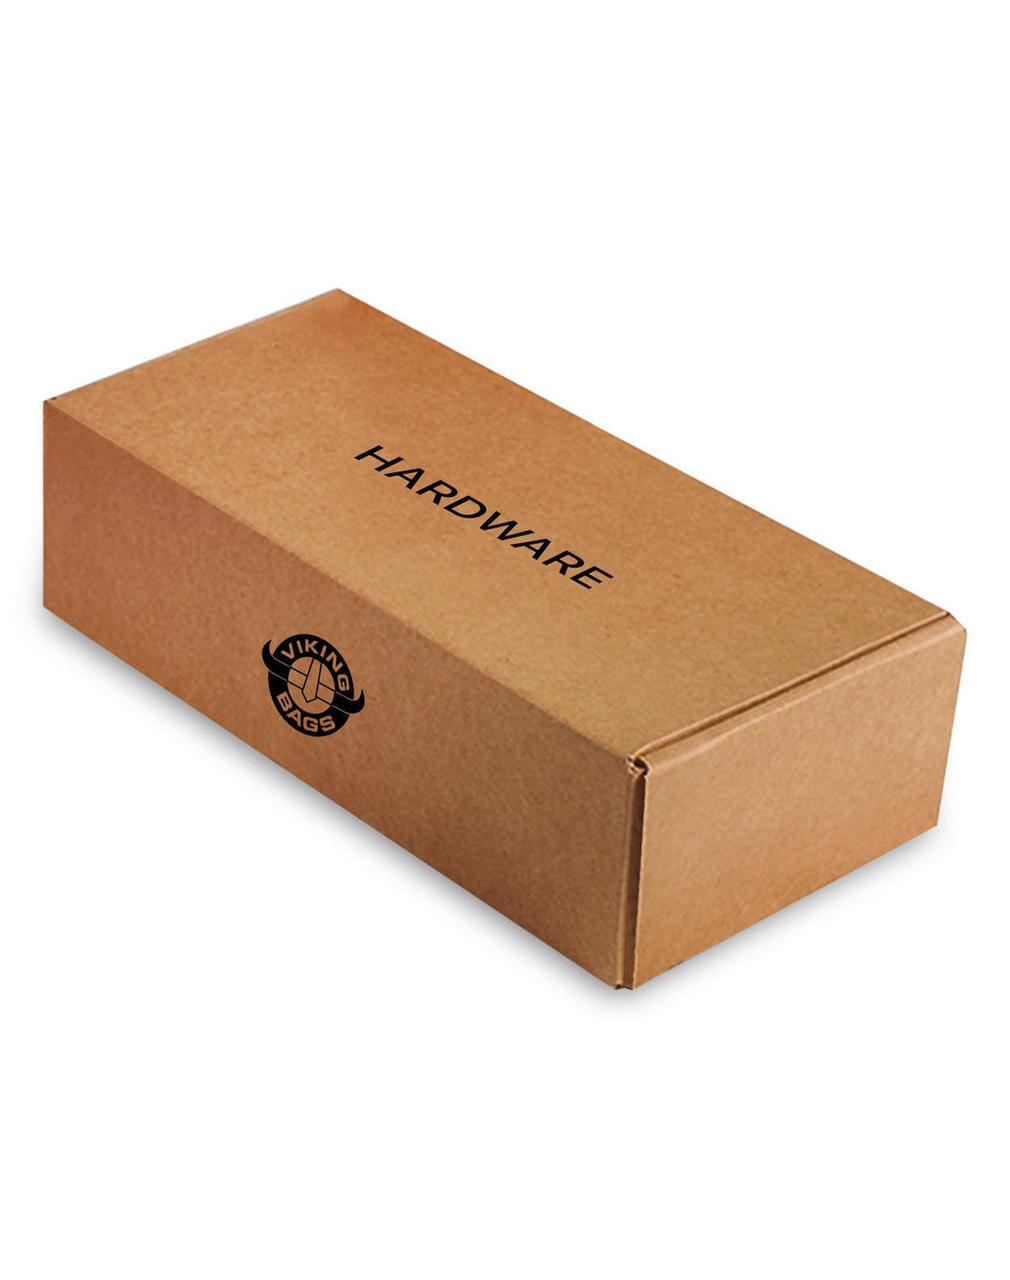 Triumph Thunderbird SS Slanted Studded Medium Motorcycle Saddlebags Box